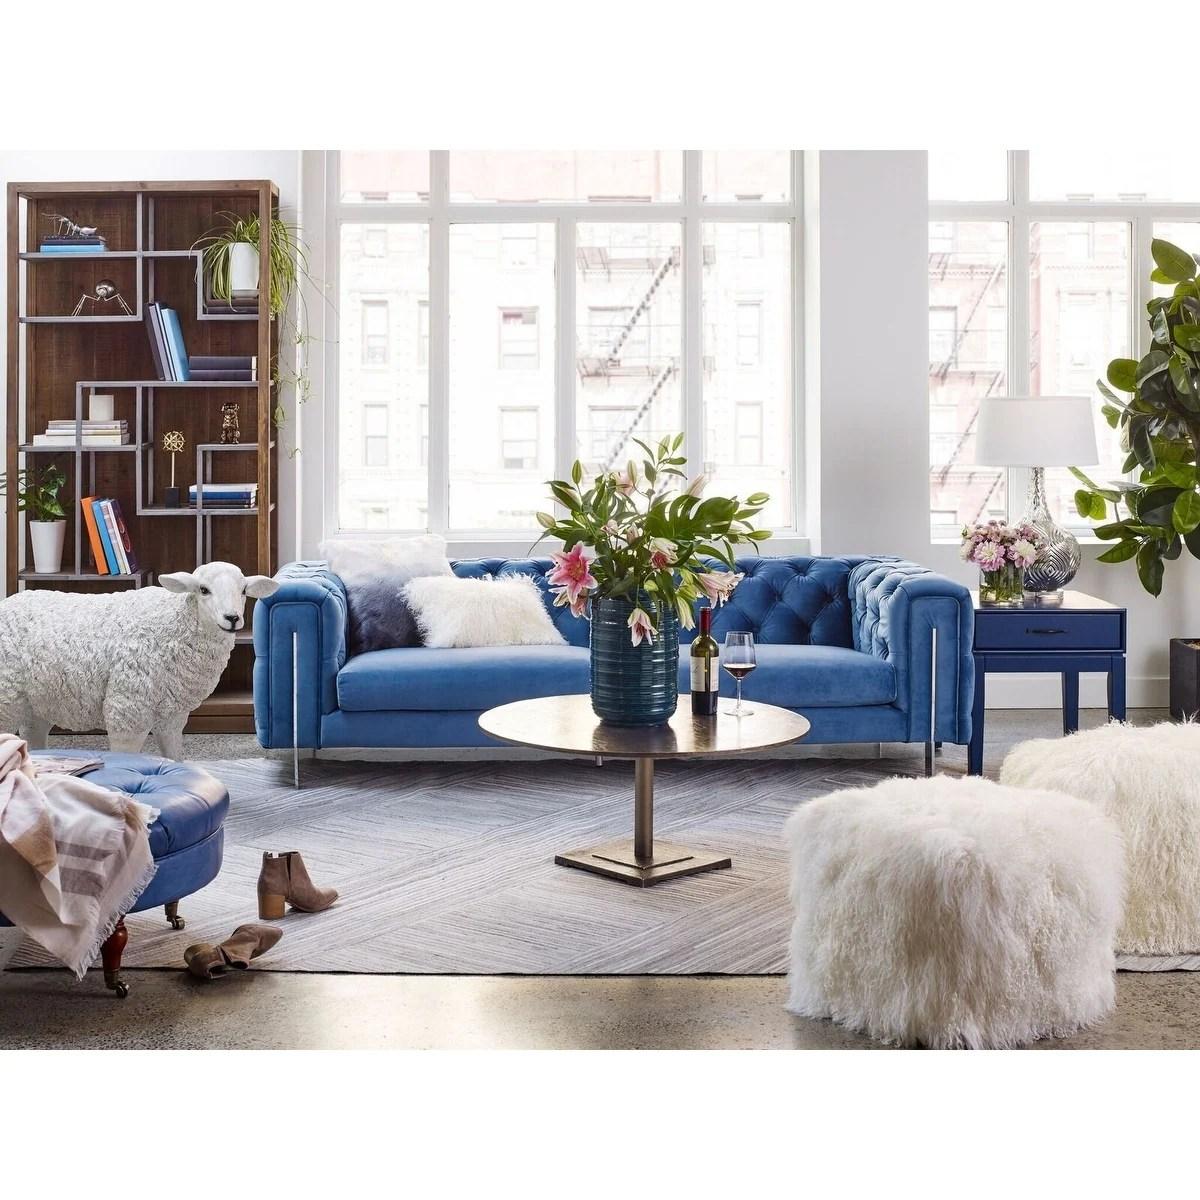 blue velvet chesterfield sofa leather sofas miami shop aurelle home modern on sale